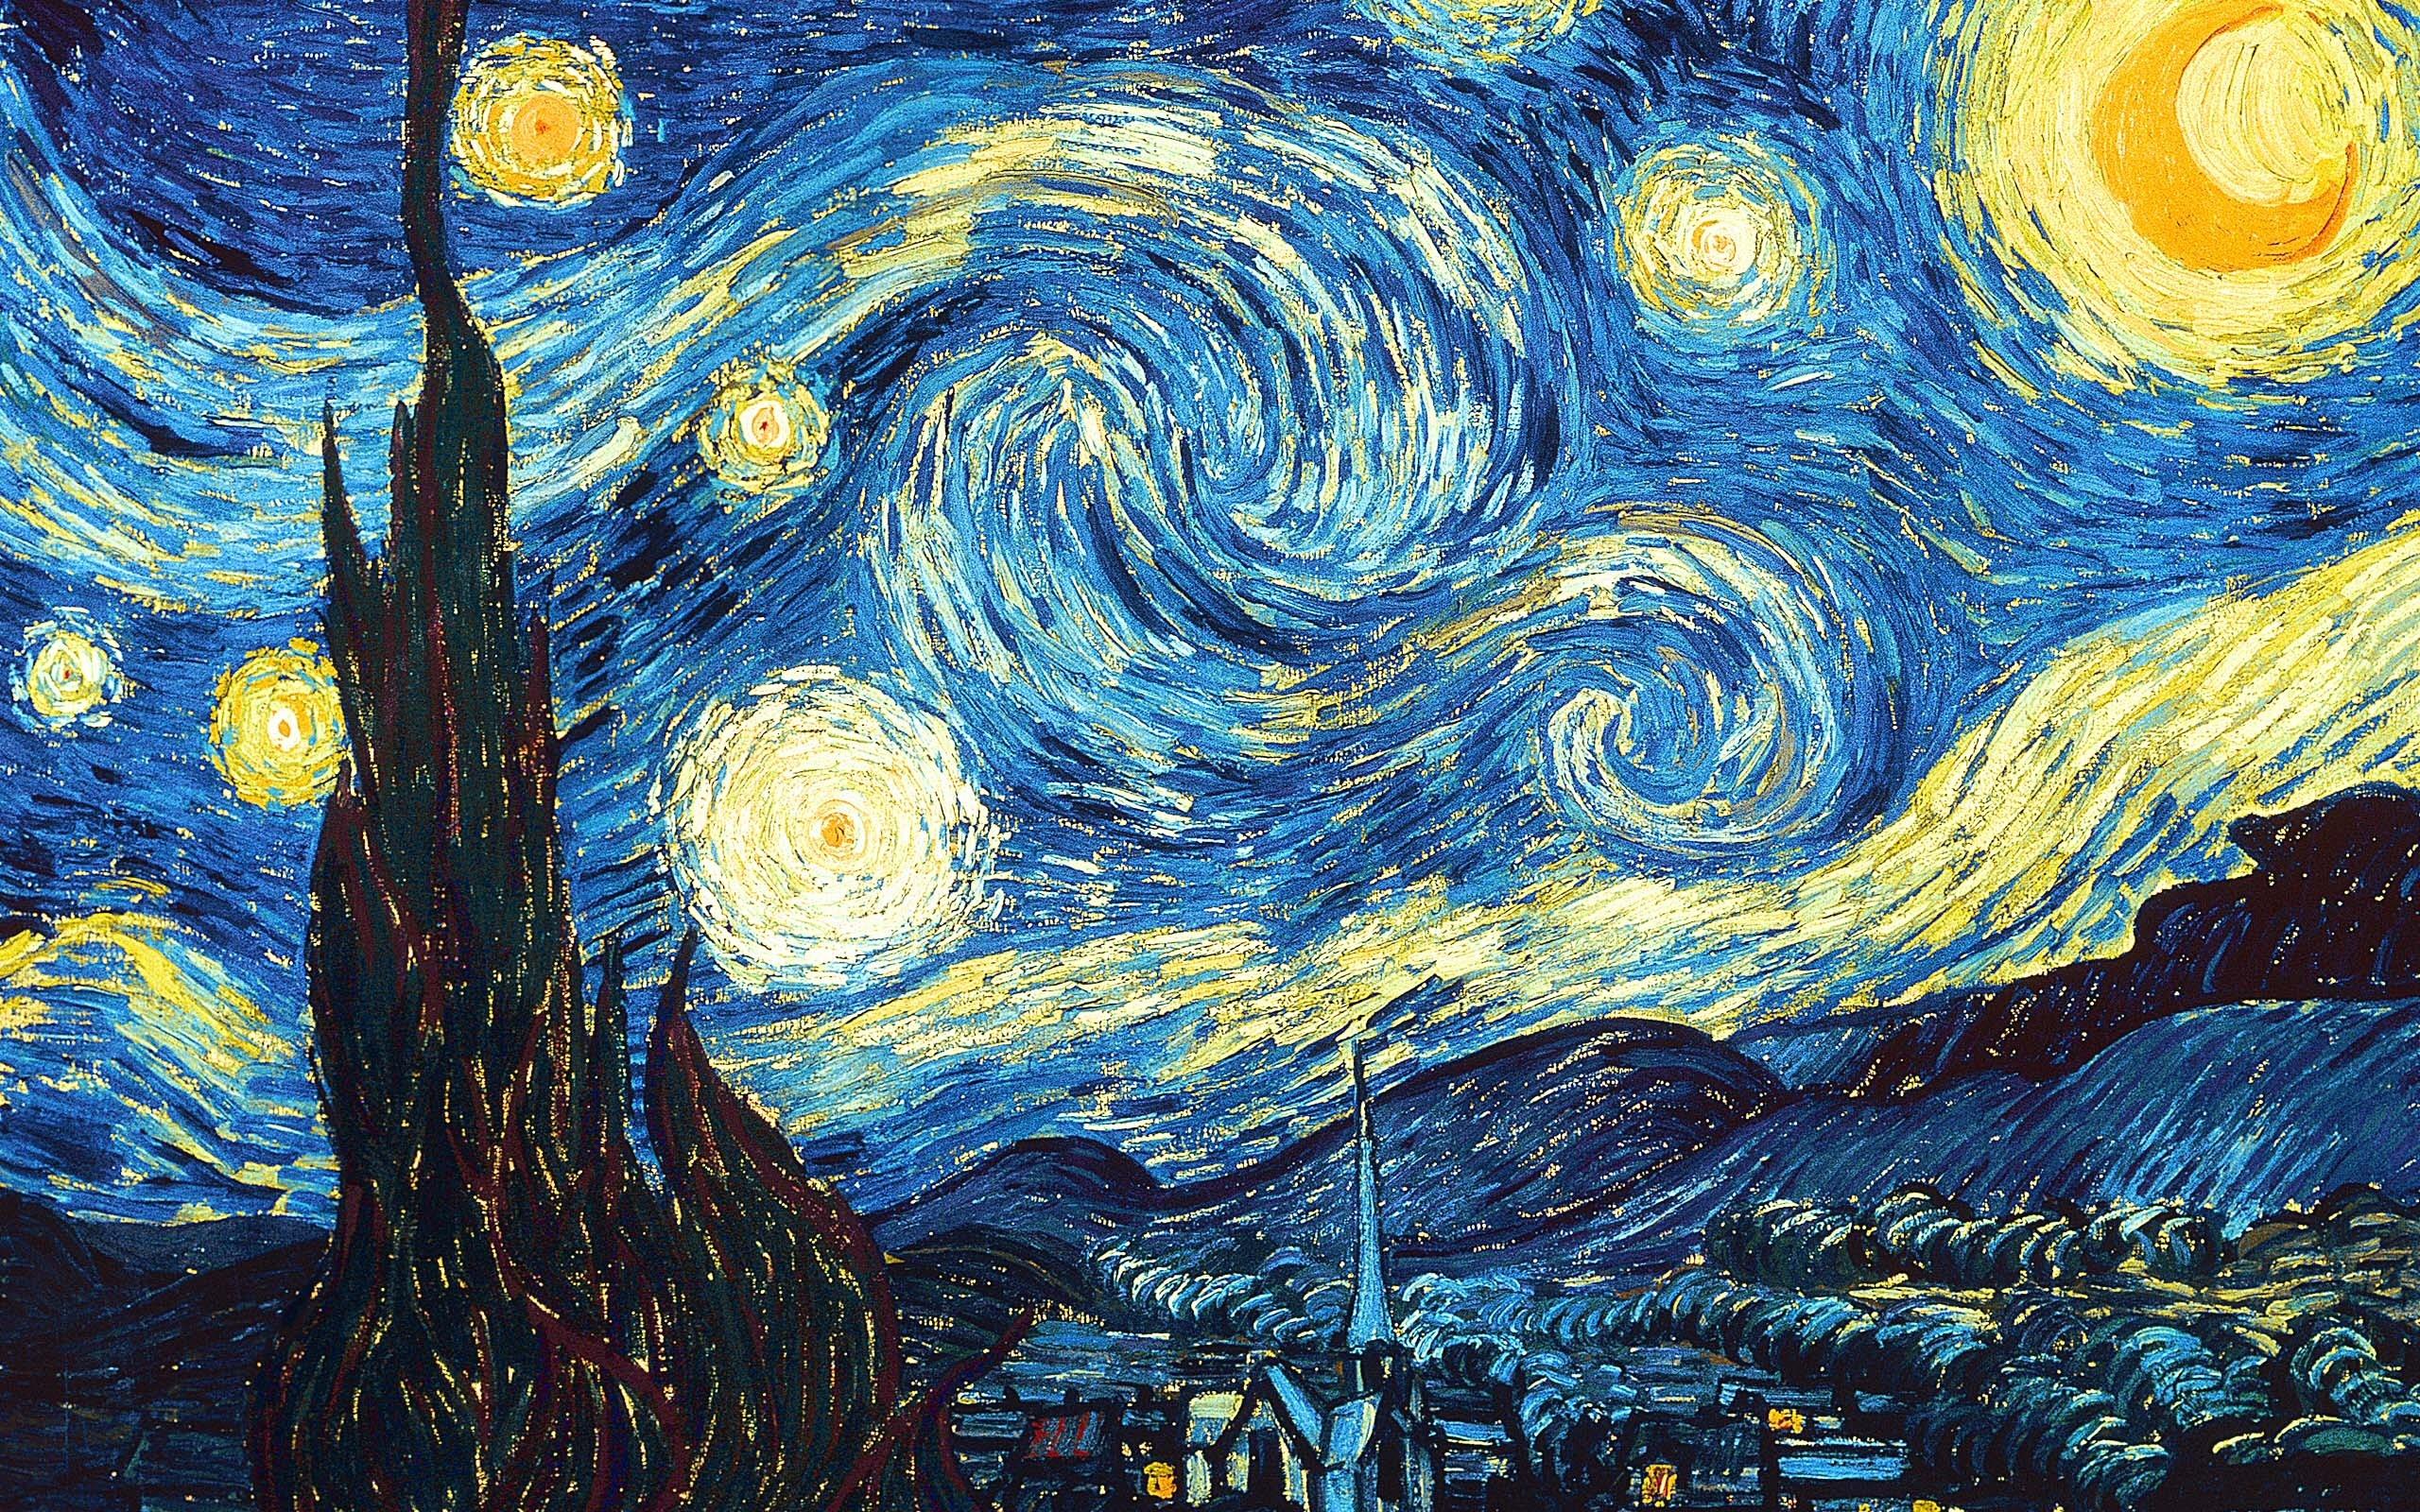 Night Wallpaper HD Widescreen The Starry Night Wallpaper Van Gogh 2560x1600